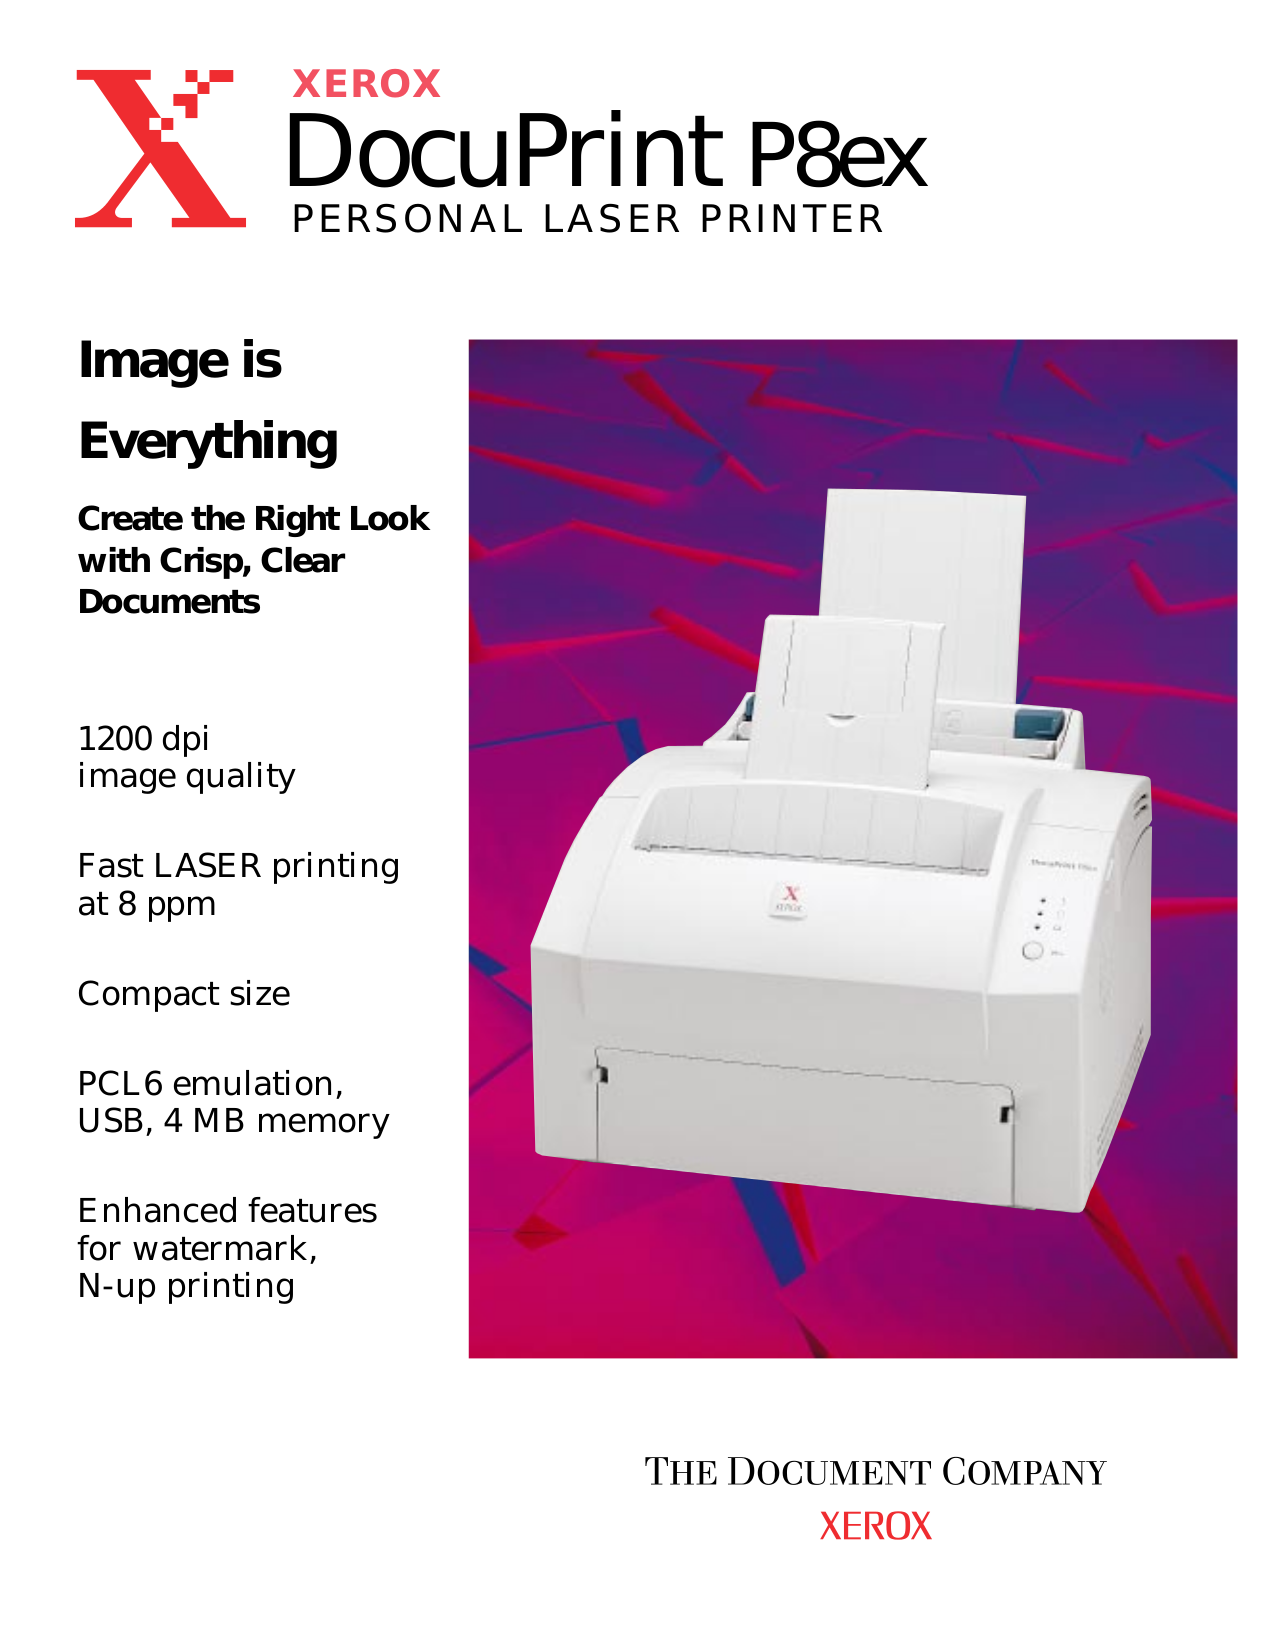 Xerox docuprint p8ex инструкция